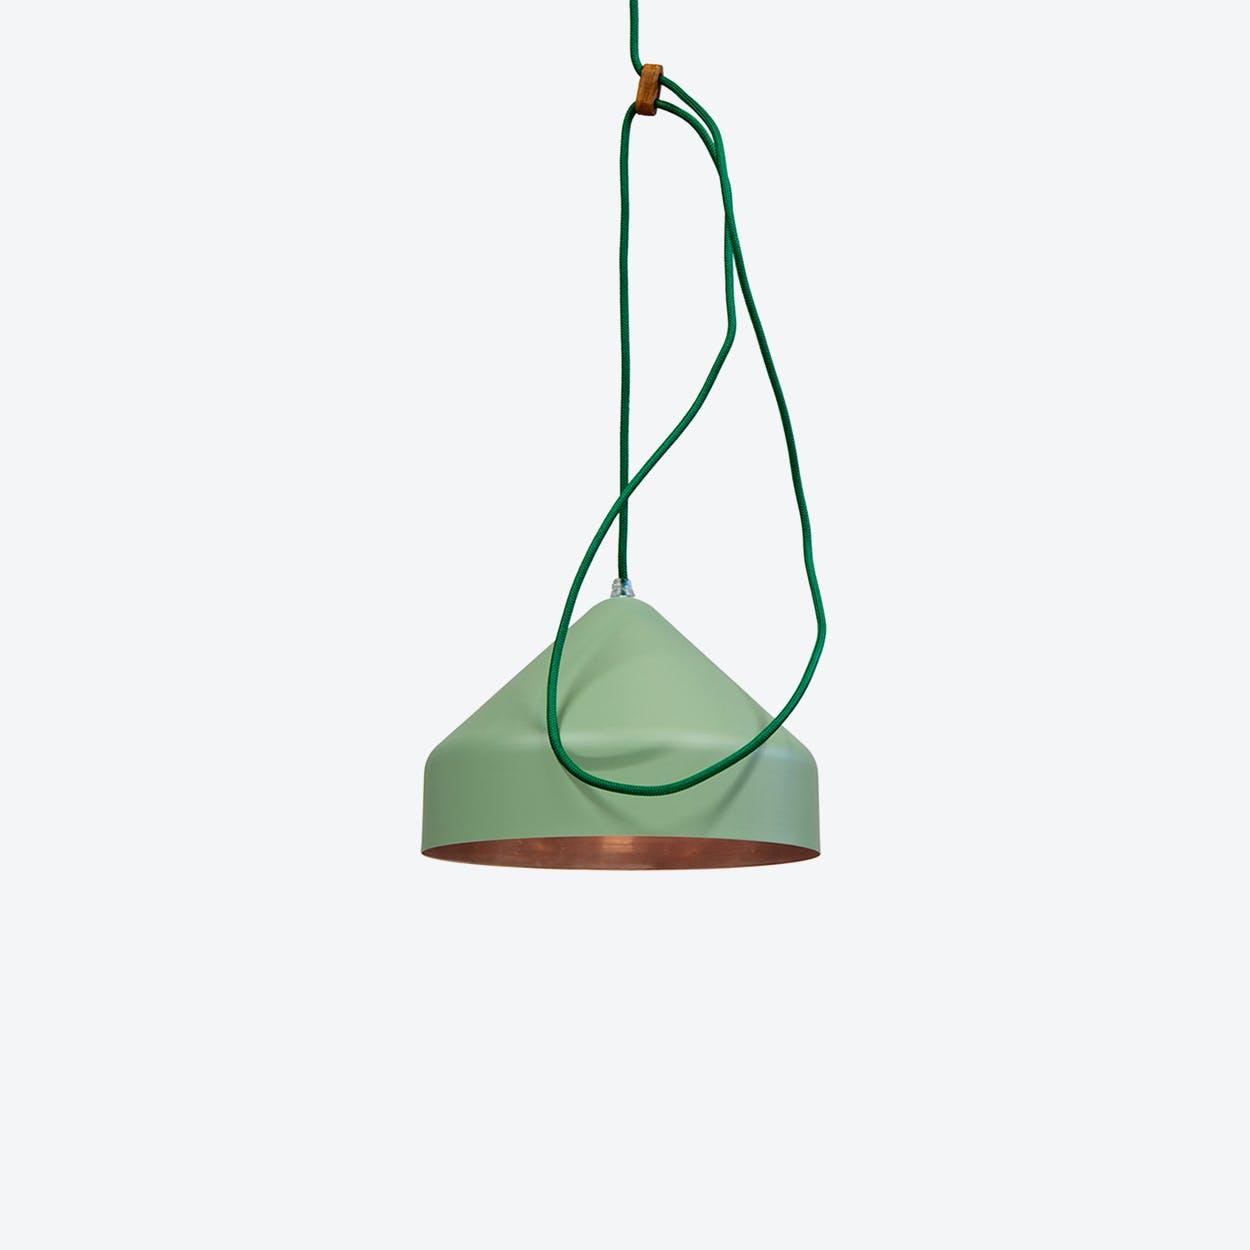 Lloop Pendant Lamp in Copper & Green